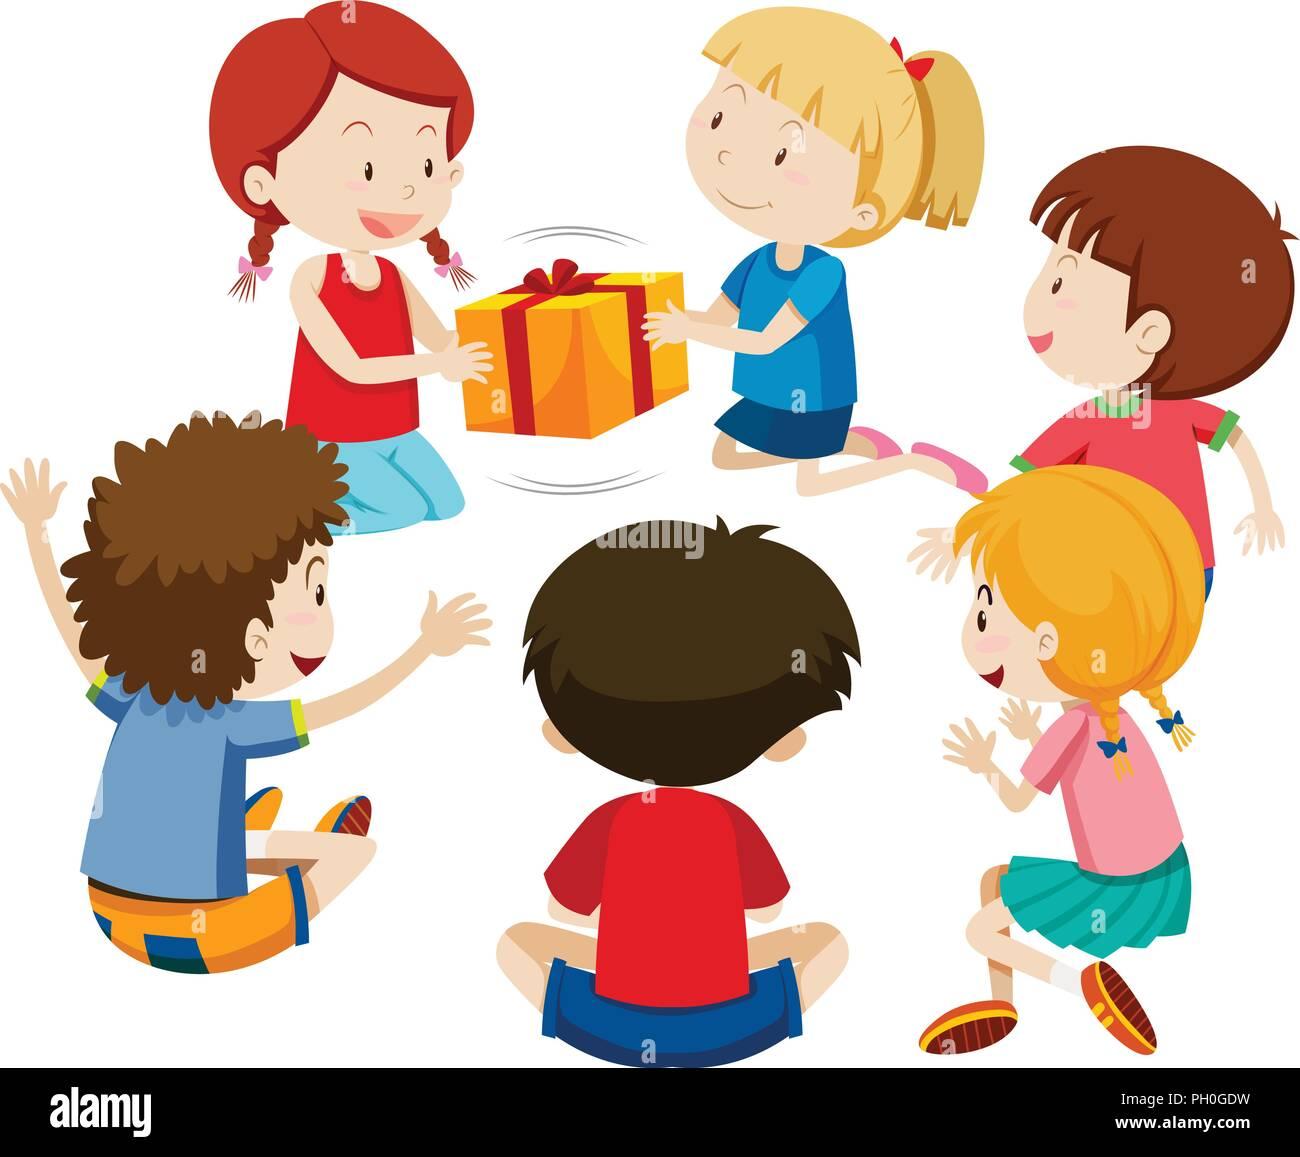 Children play present game illustration - Stock Vector